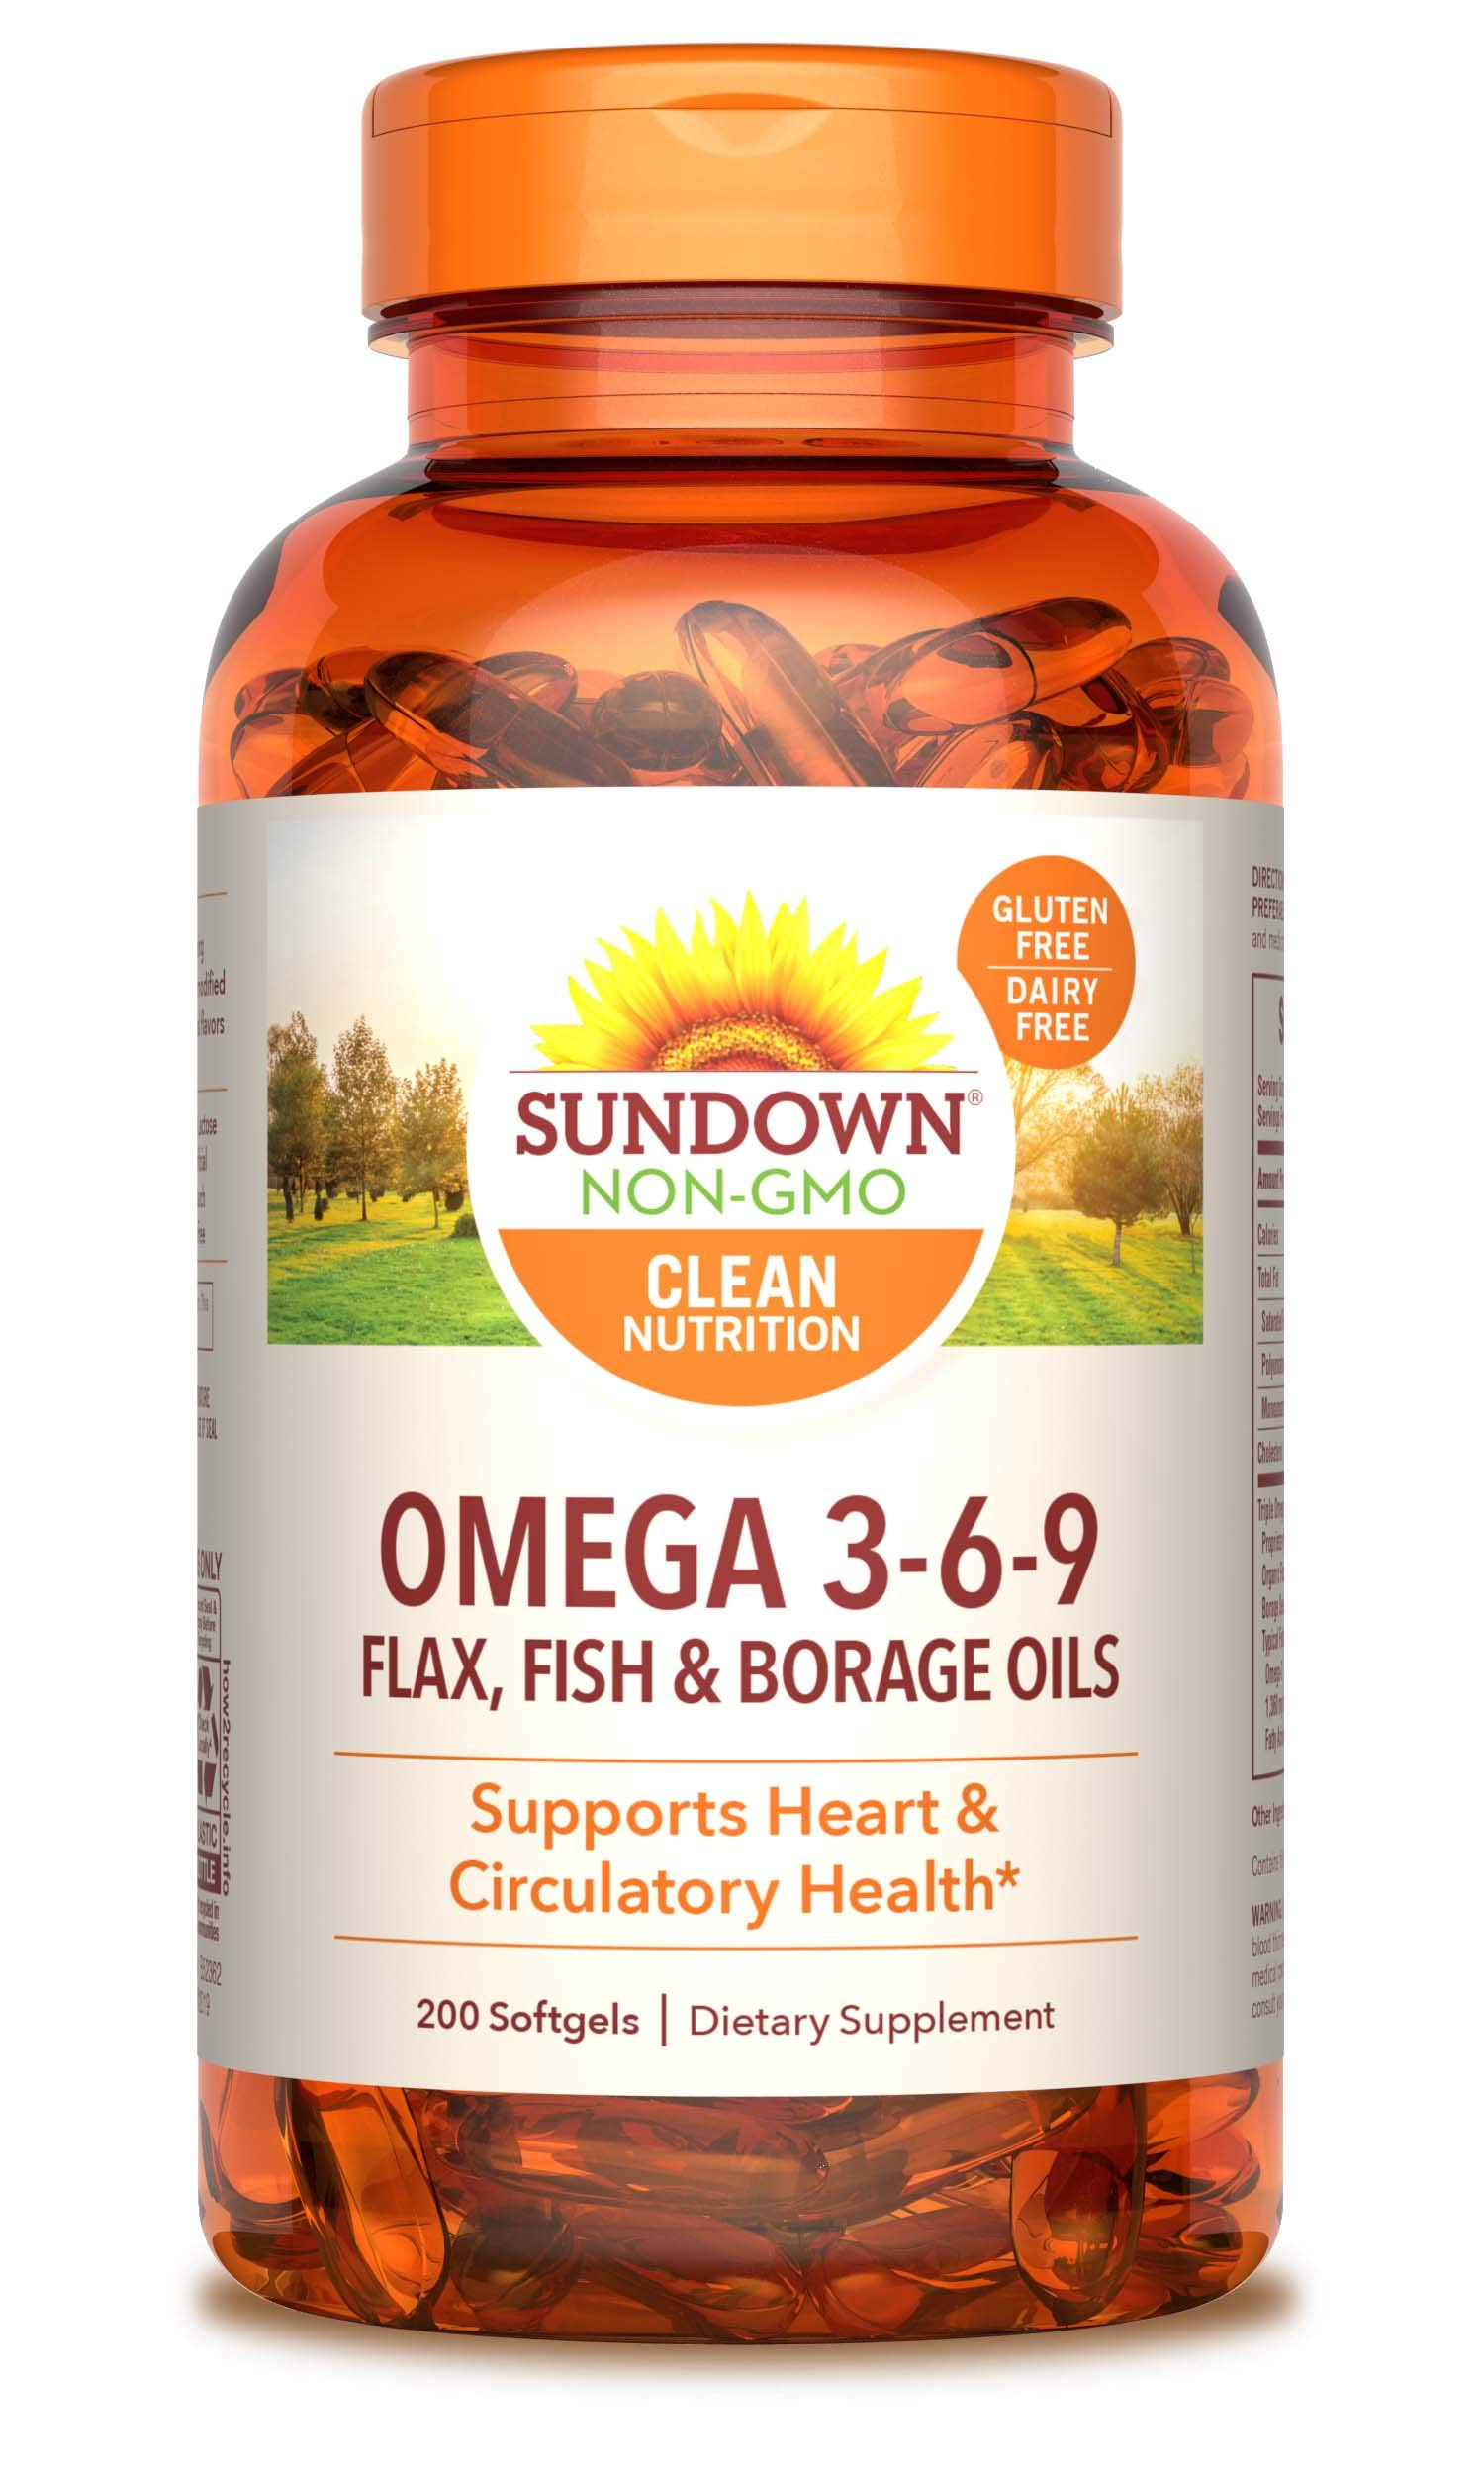 Sundown Triple Omega 3-6-9, 200 Softgels (Packaging May Vary) by Sundown